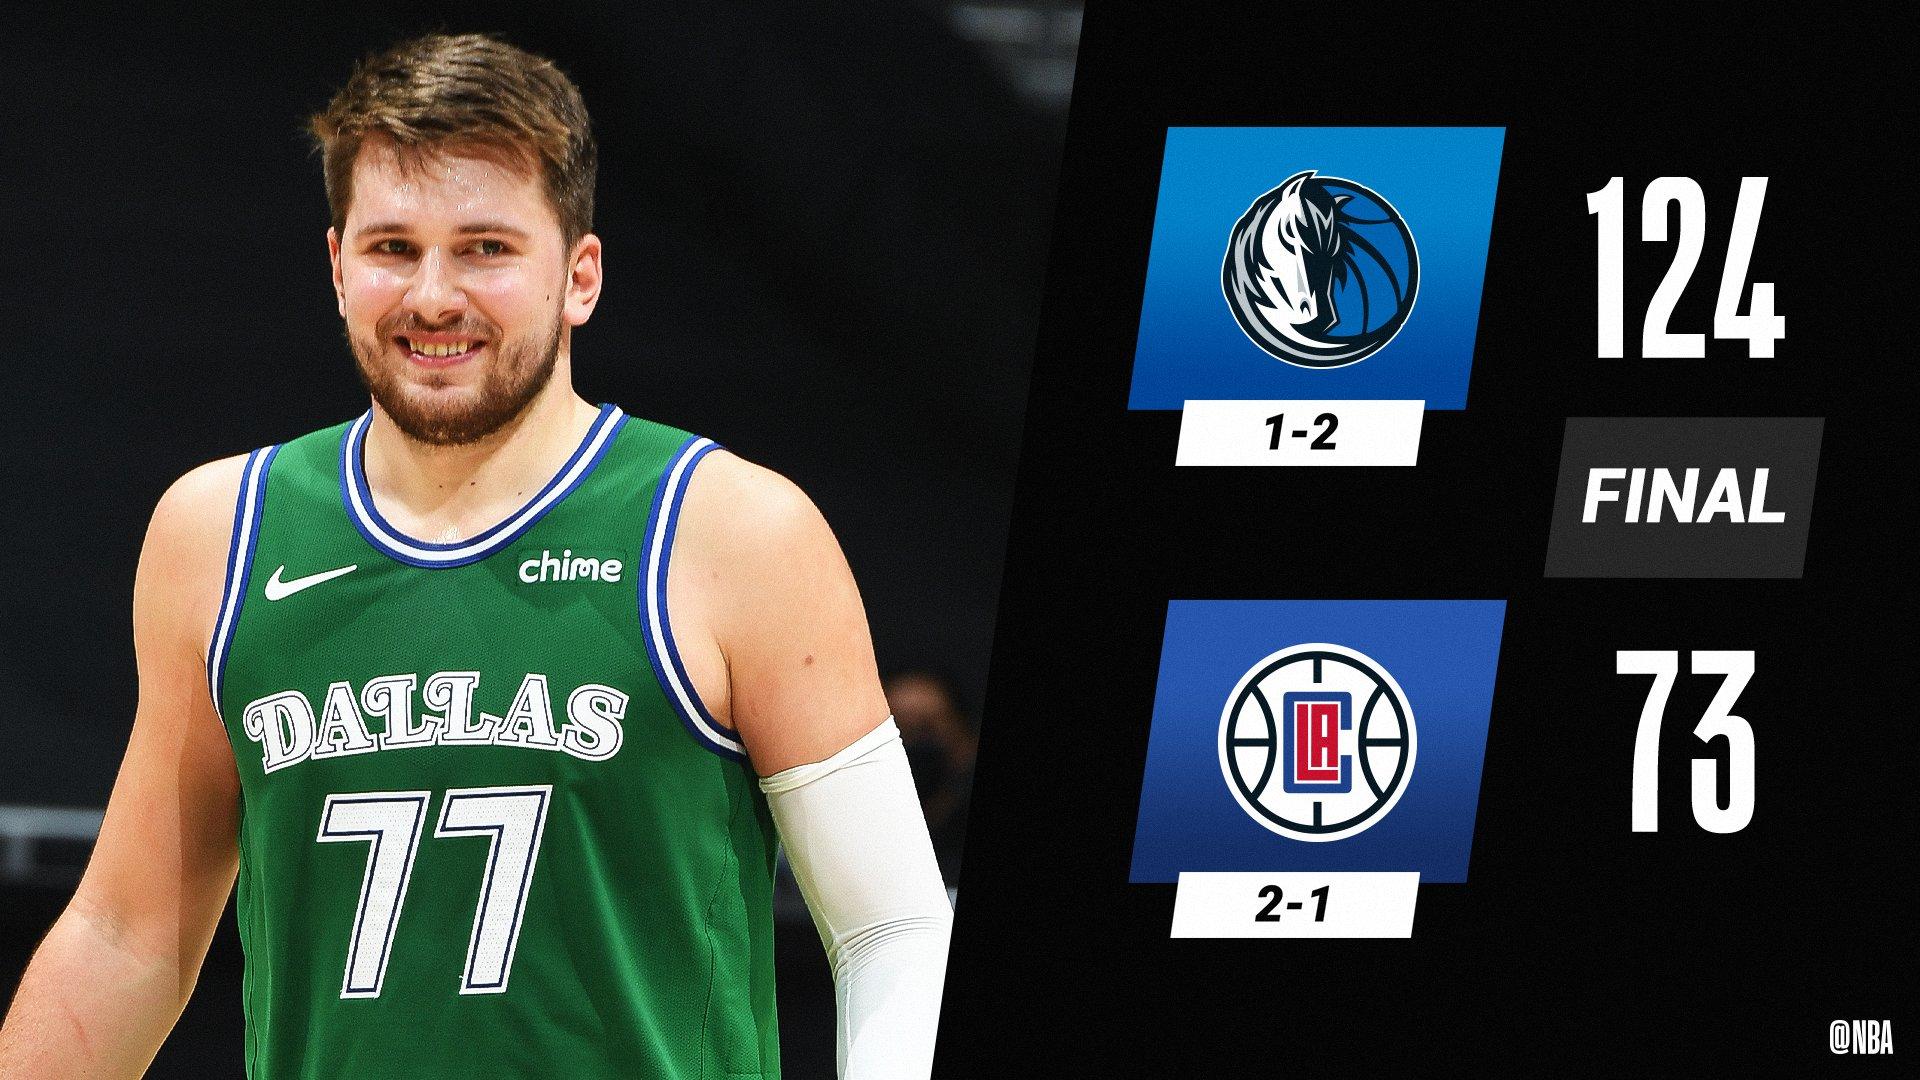 28-12-3